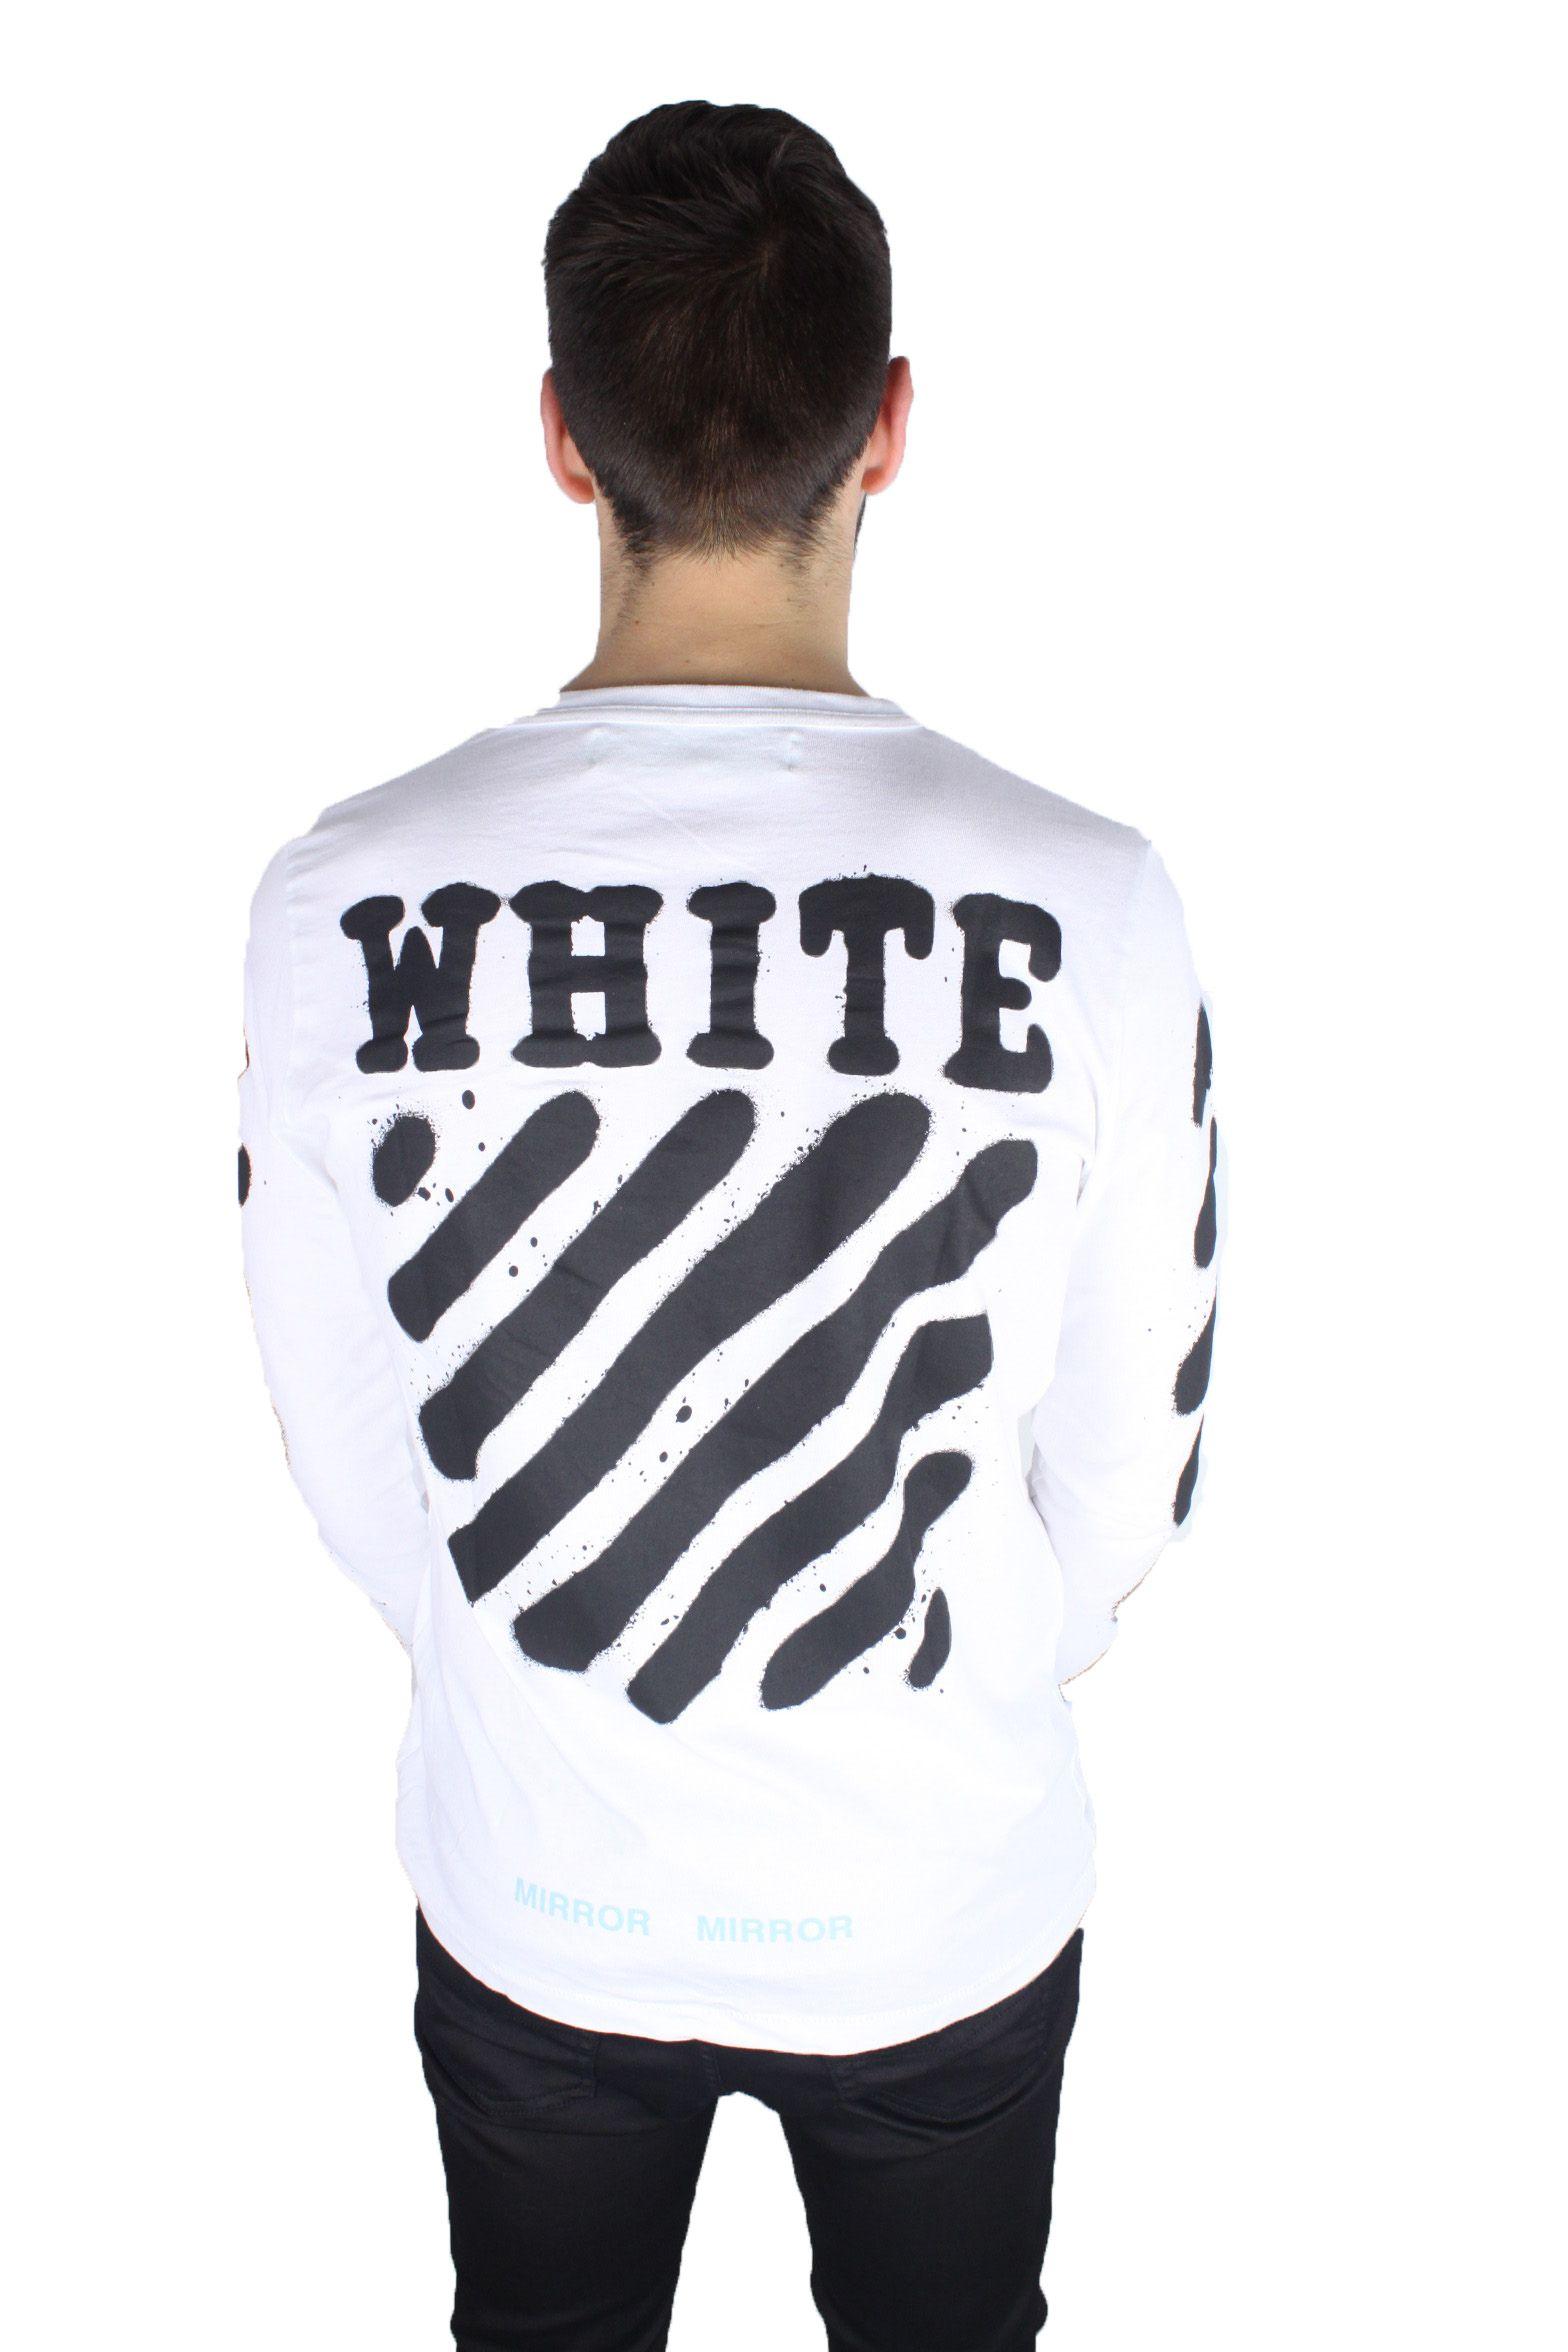 Off-White Diag Spray Long-Sleeved Tee OMAB001 S17185023 0110 T-Shirt